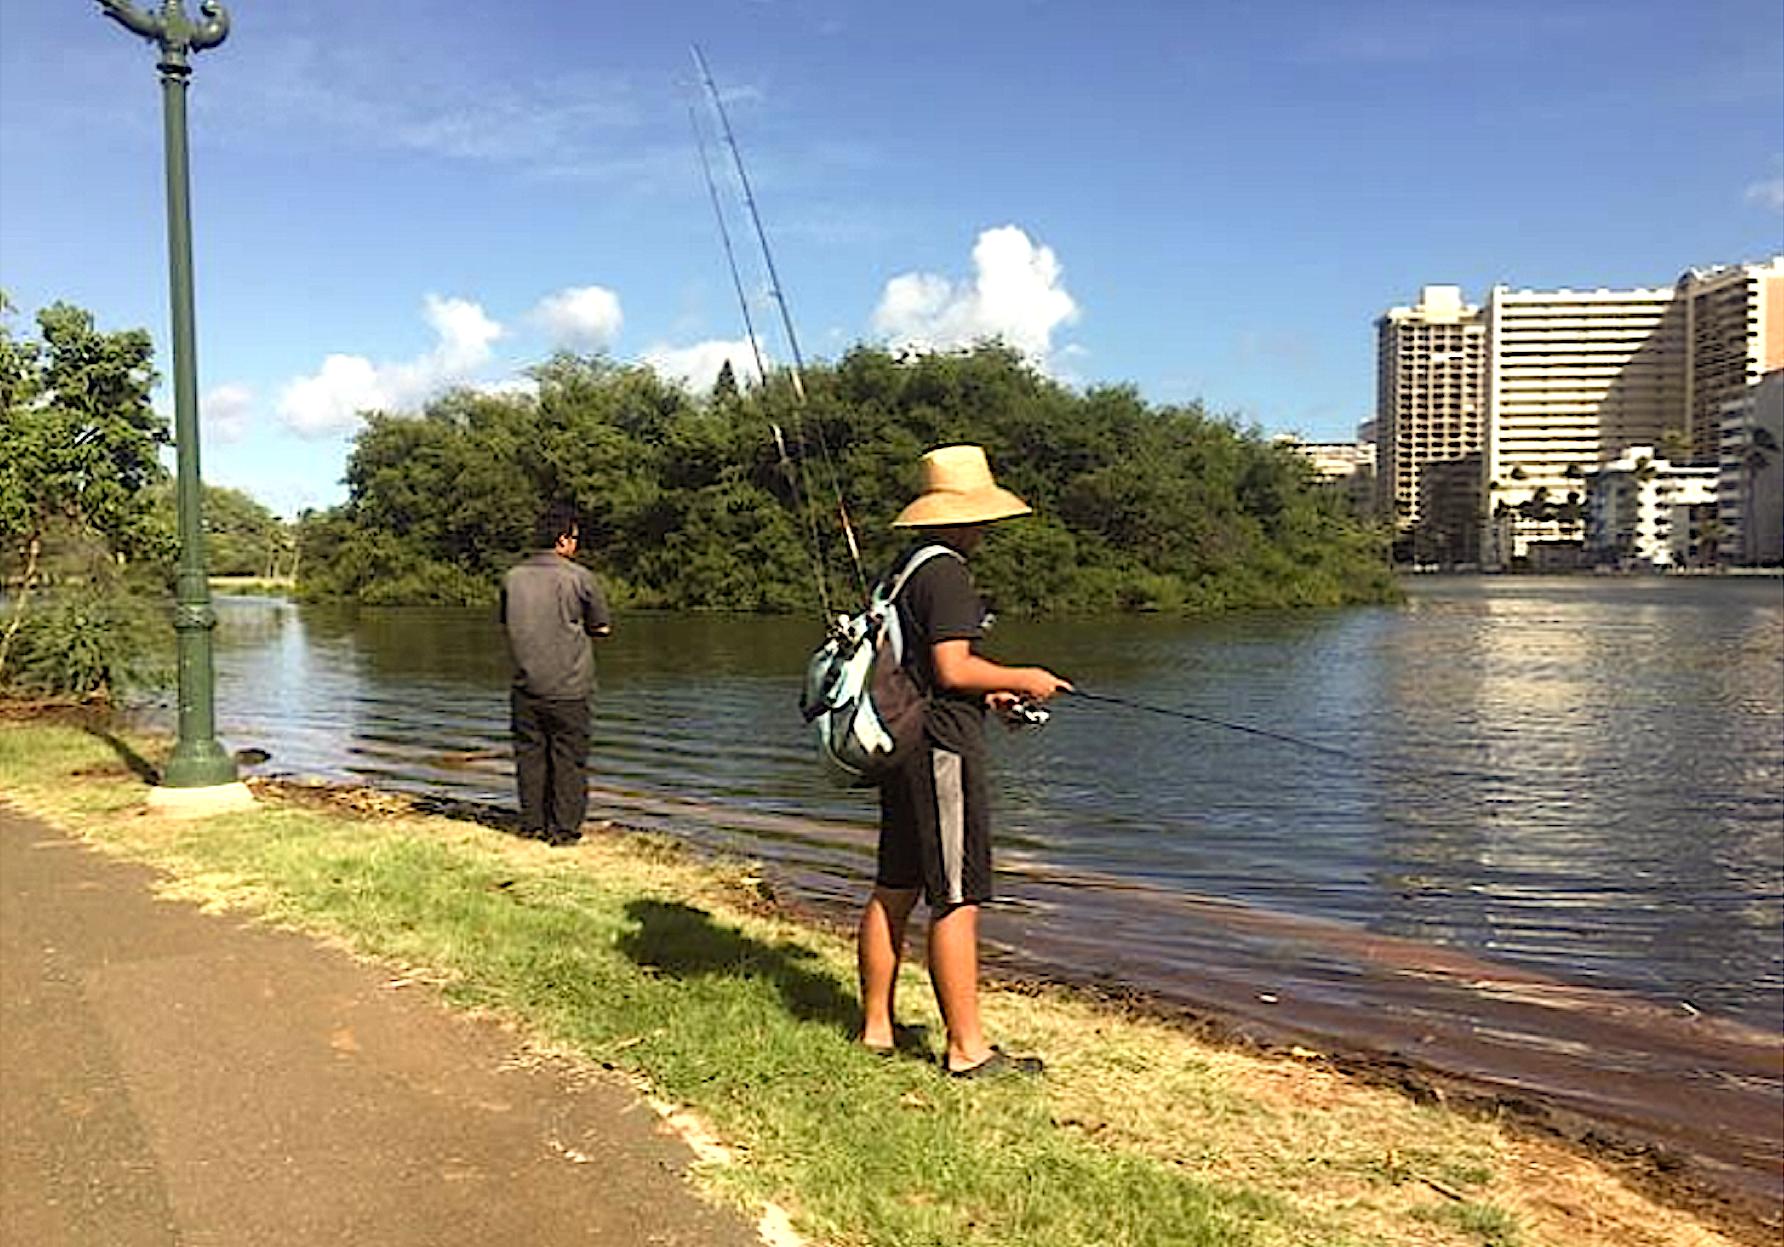 King tides overtop the walls of the Ala Wai Canal in Mōʻiliʻili, Hawaiʻi (credit: Hawaiʻi and Pacific Islands King Tides Project)